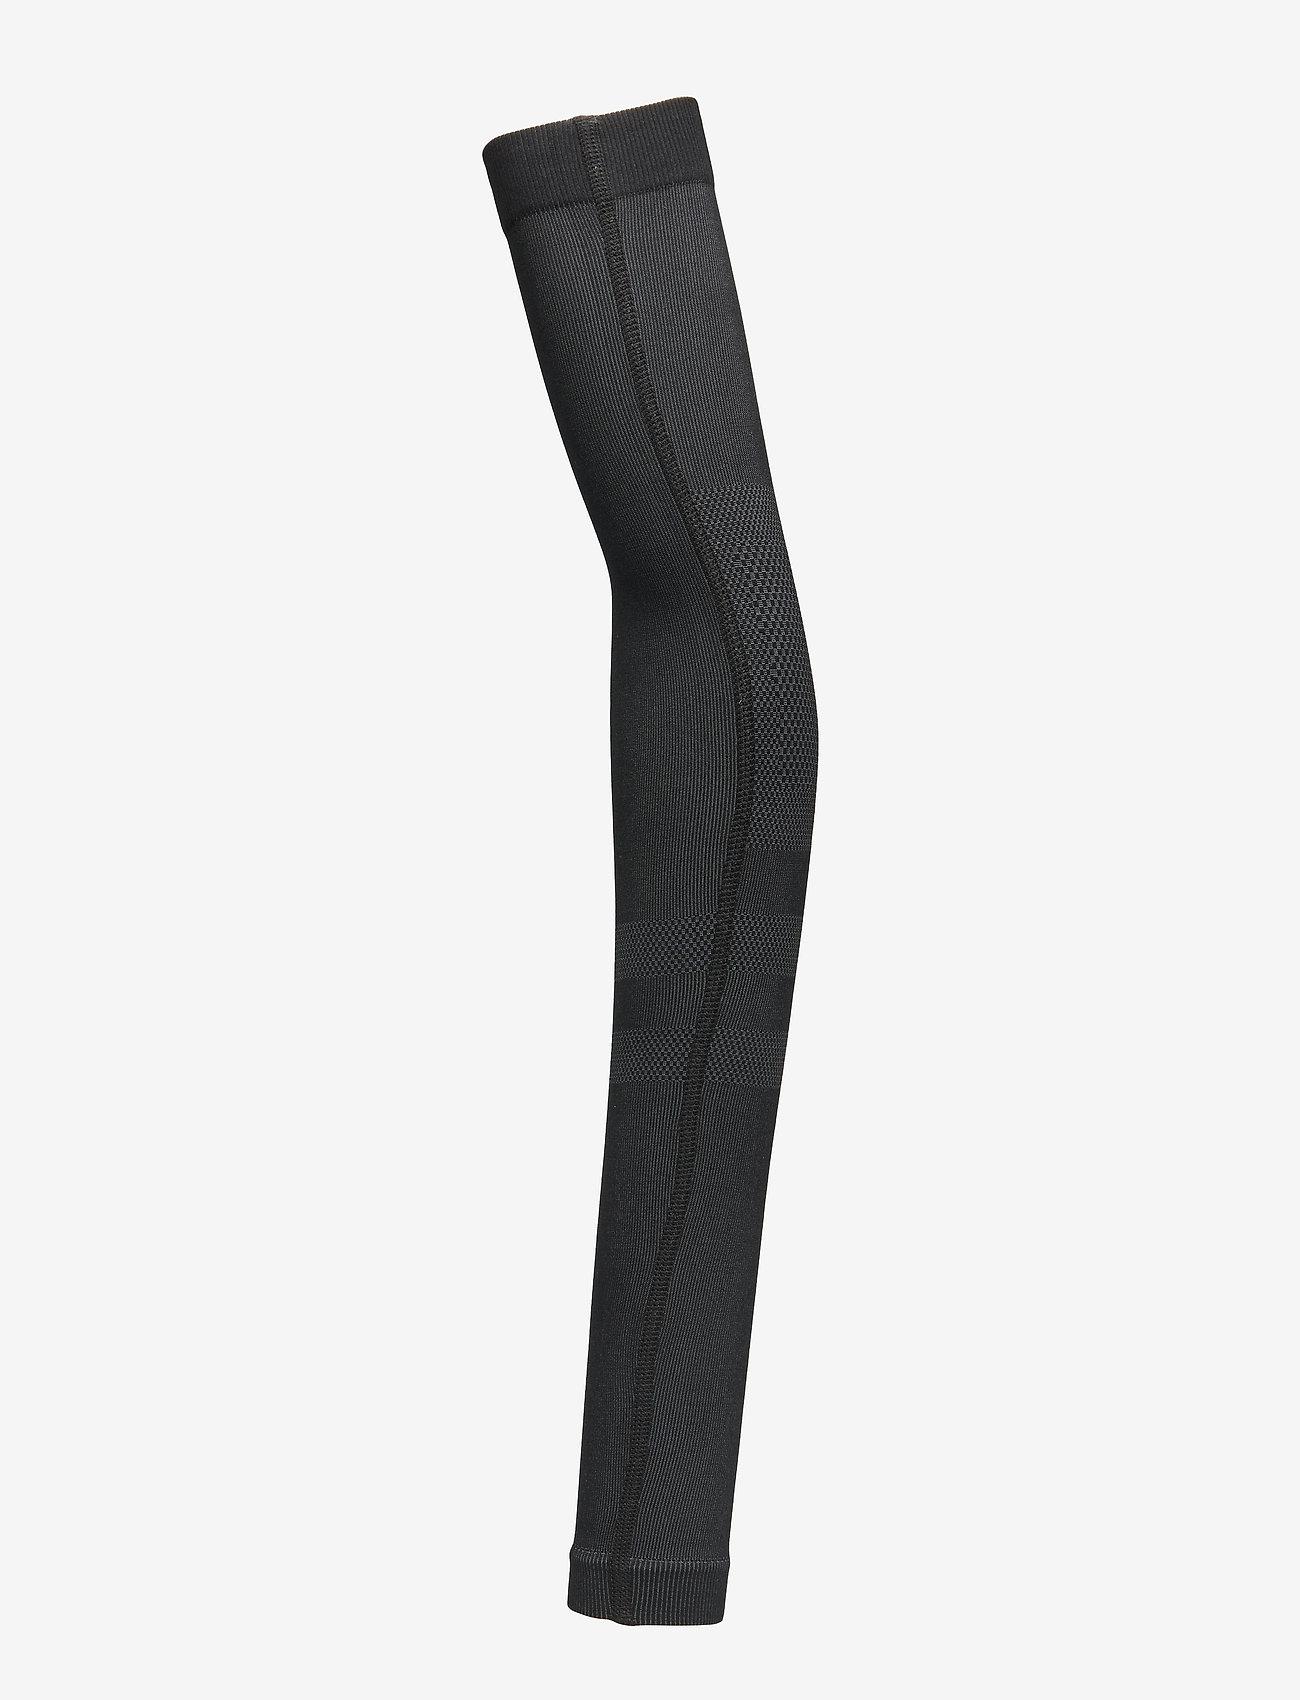 Craft - Seamless Arm Warmer 2.0 - other - black - 1